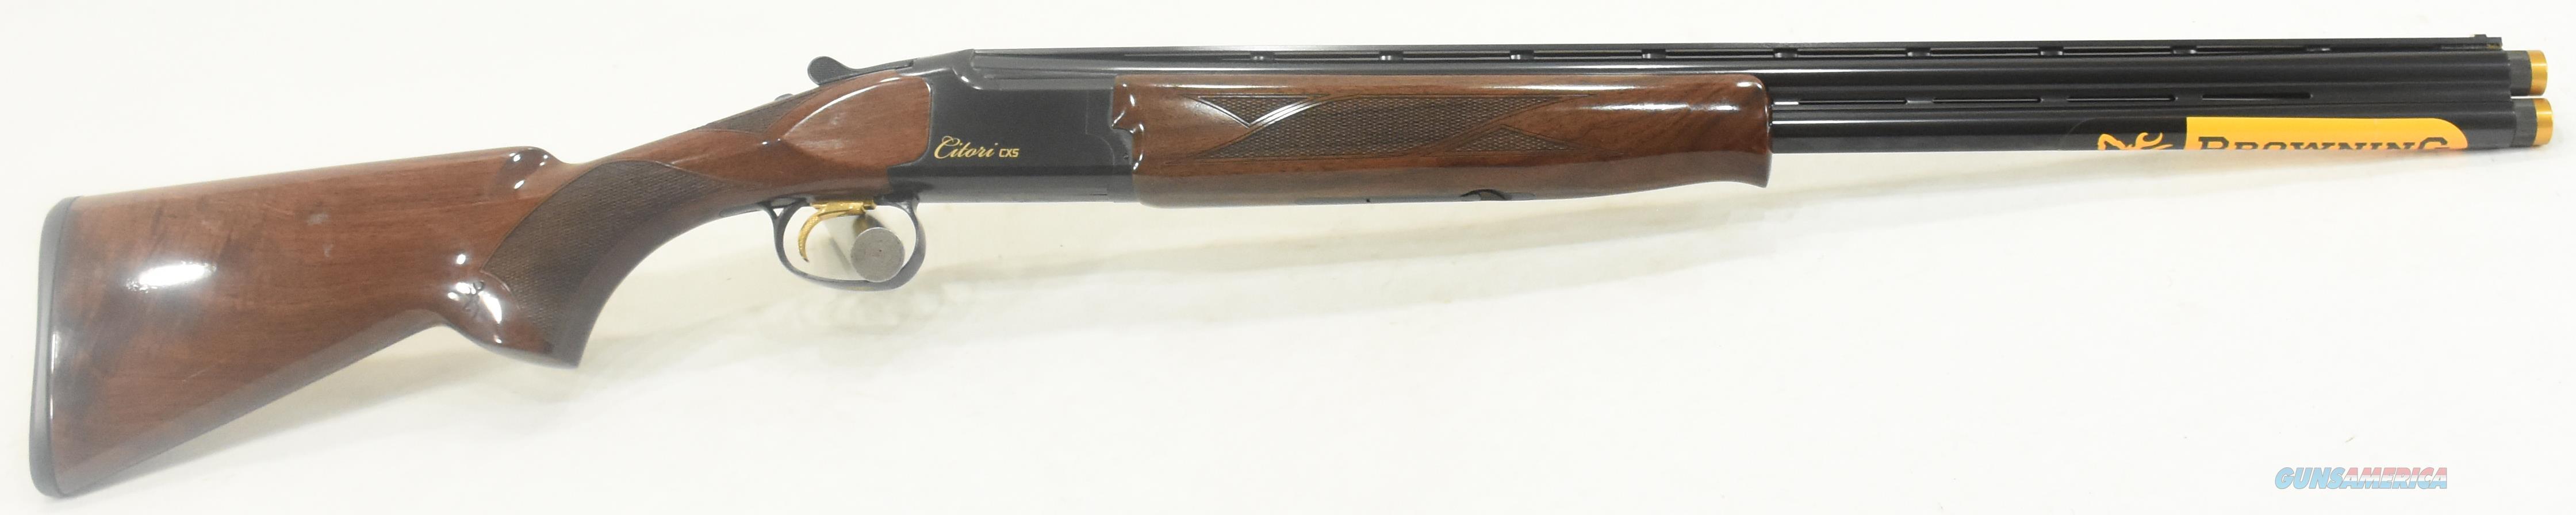 Citori CXS Micro 20Ga 24-3In  018140606  Guns > Shotguns > Browning Shotguns > Over Unders > Citori > Hunting